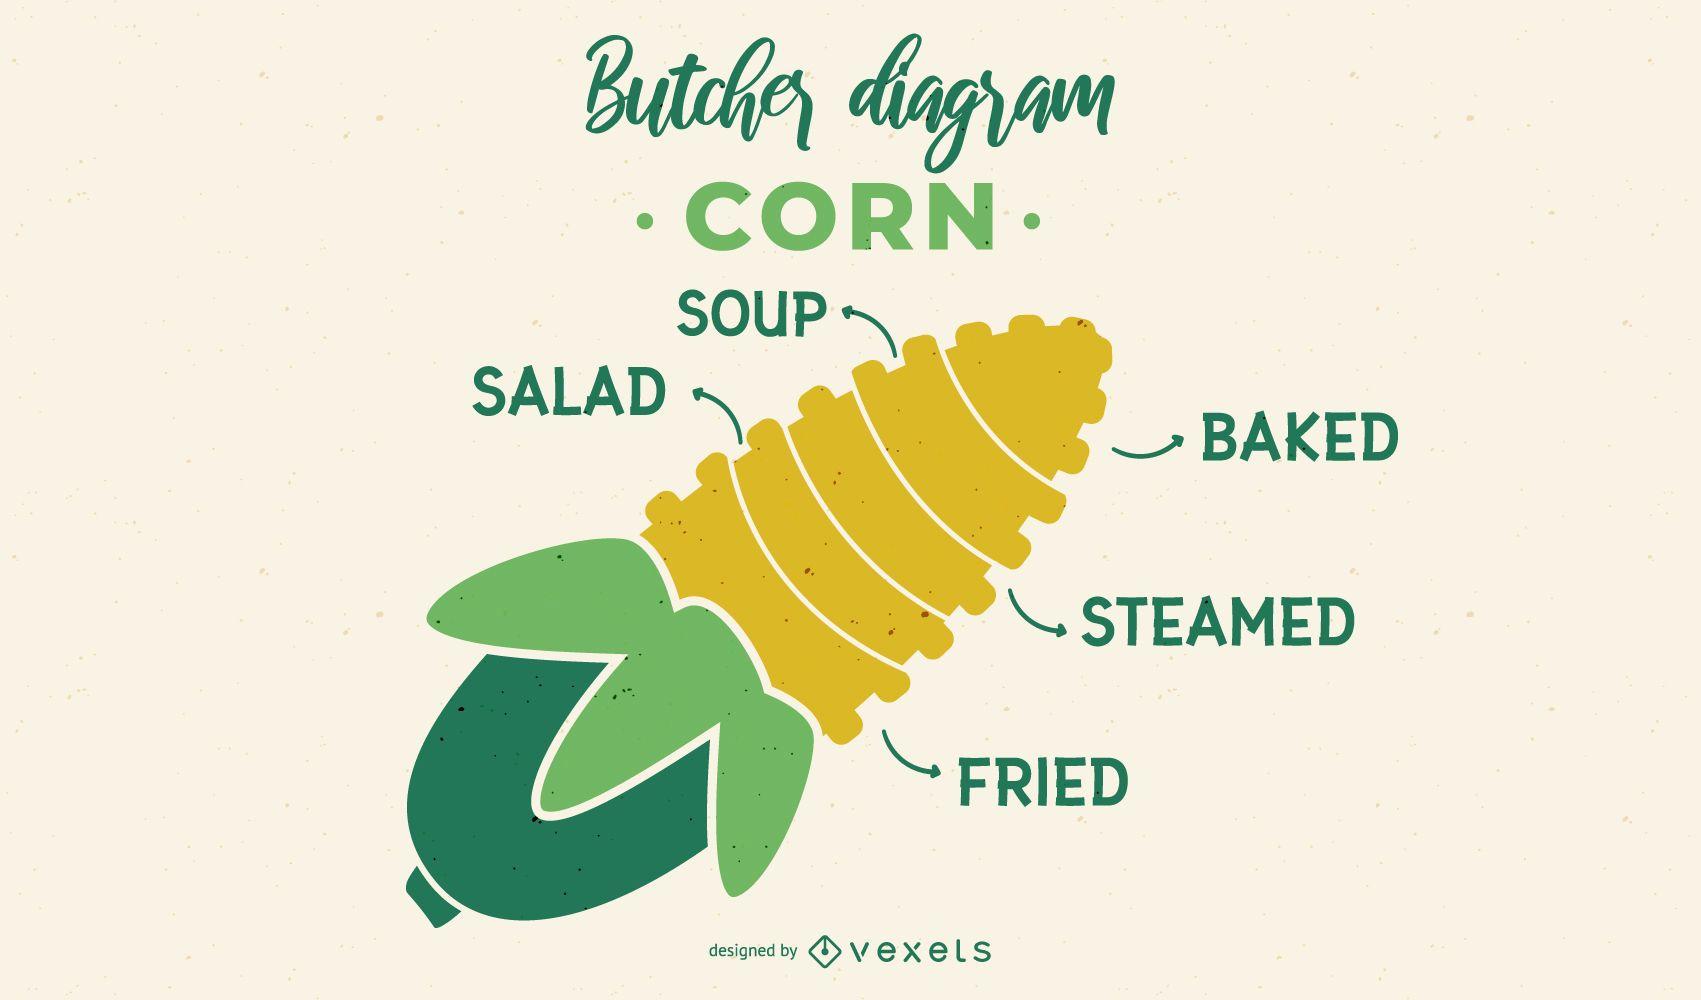 Corn Butcher Diagram Design